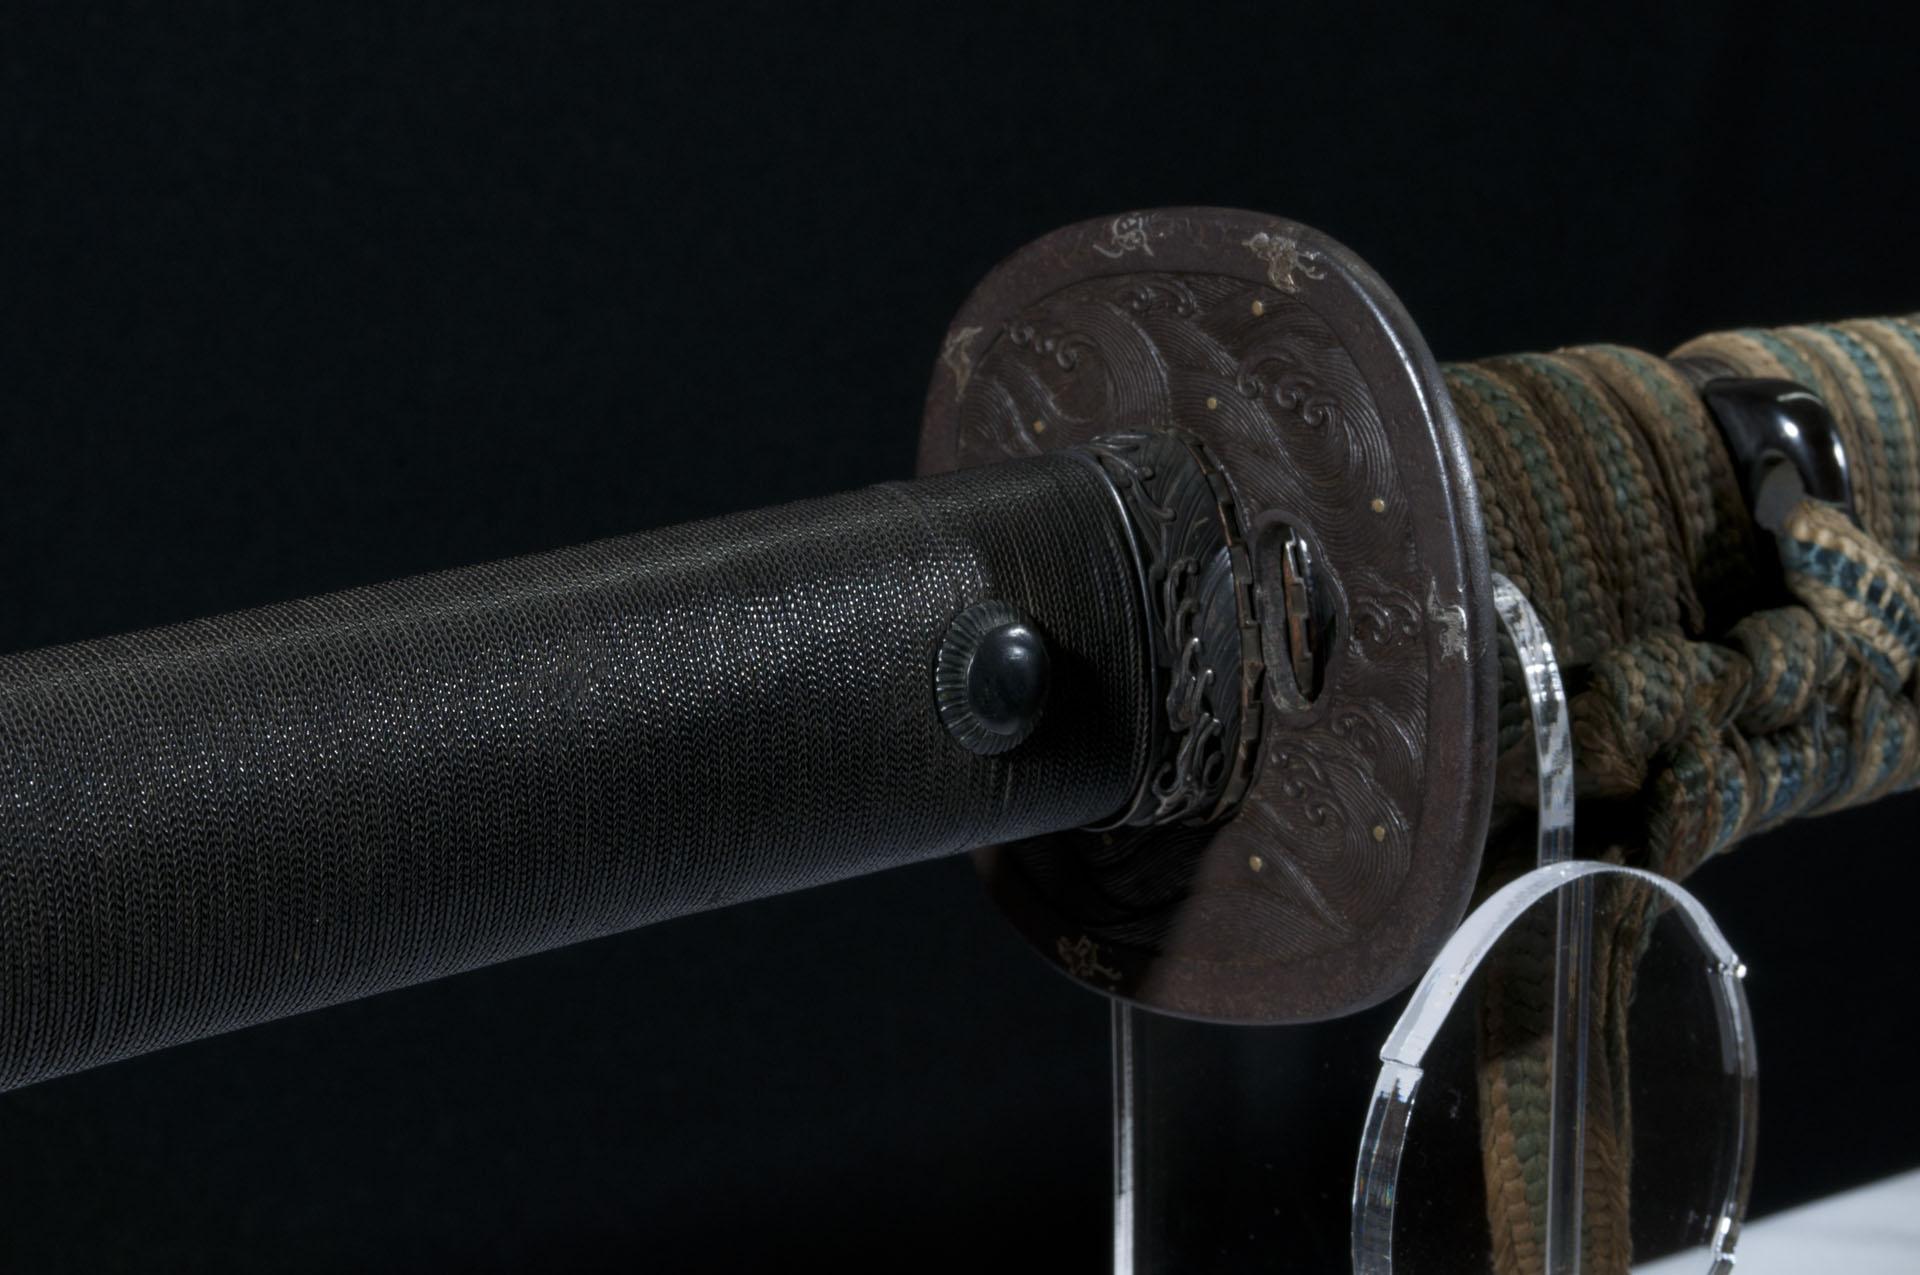 Katana sabre japonais Shinto Masatsune (7)